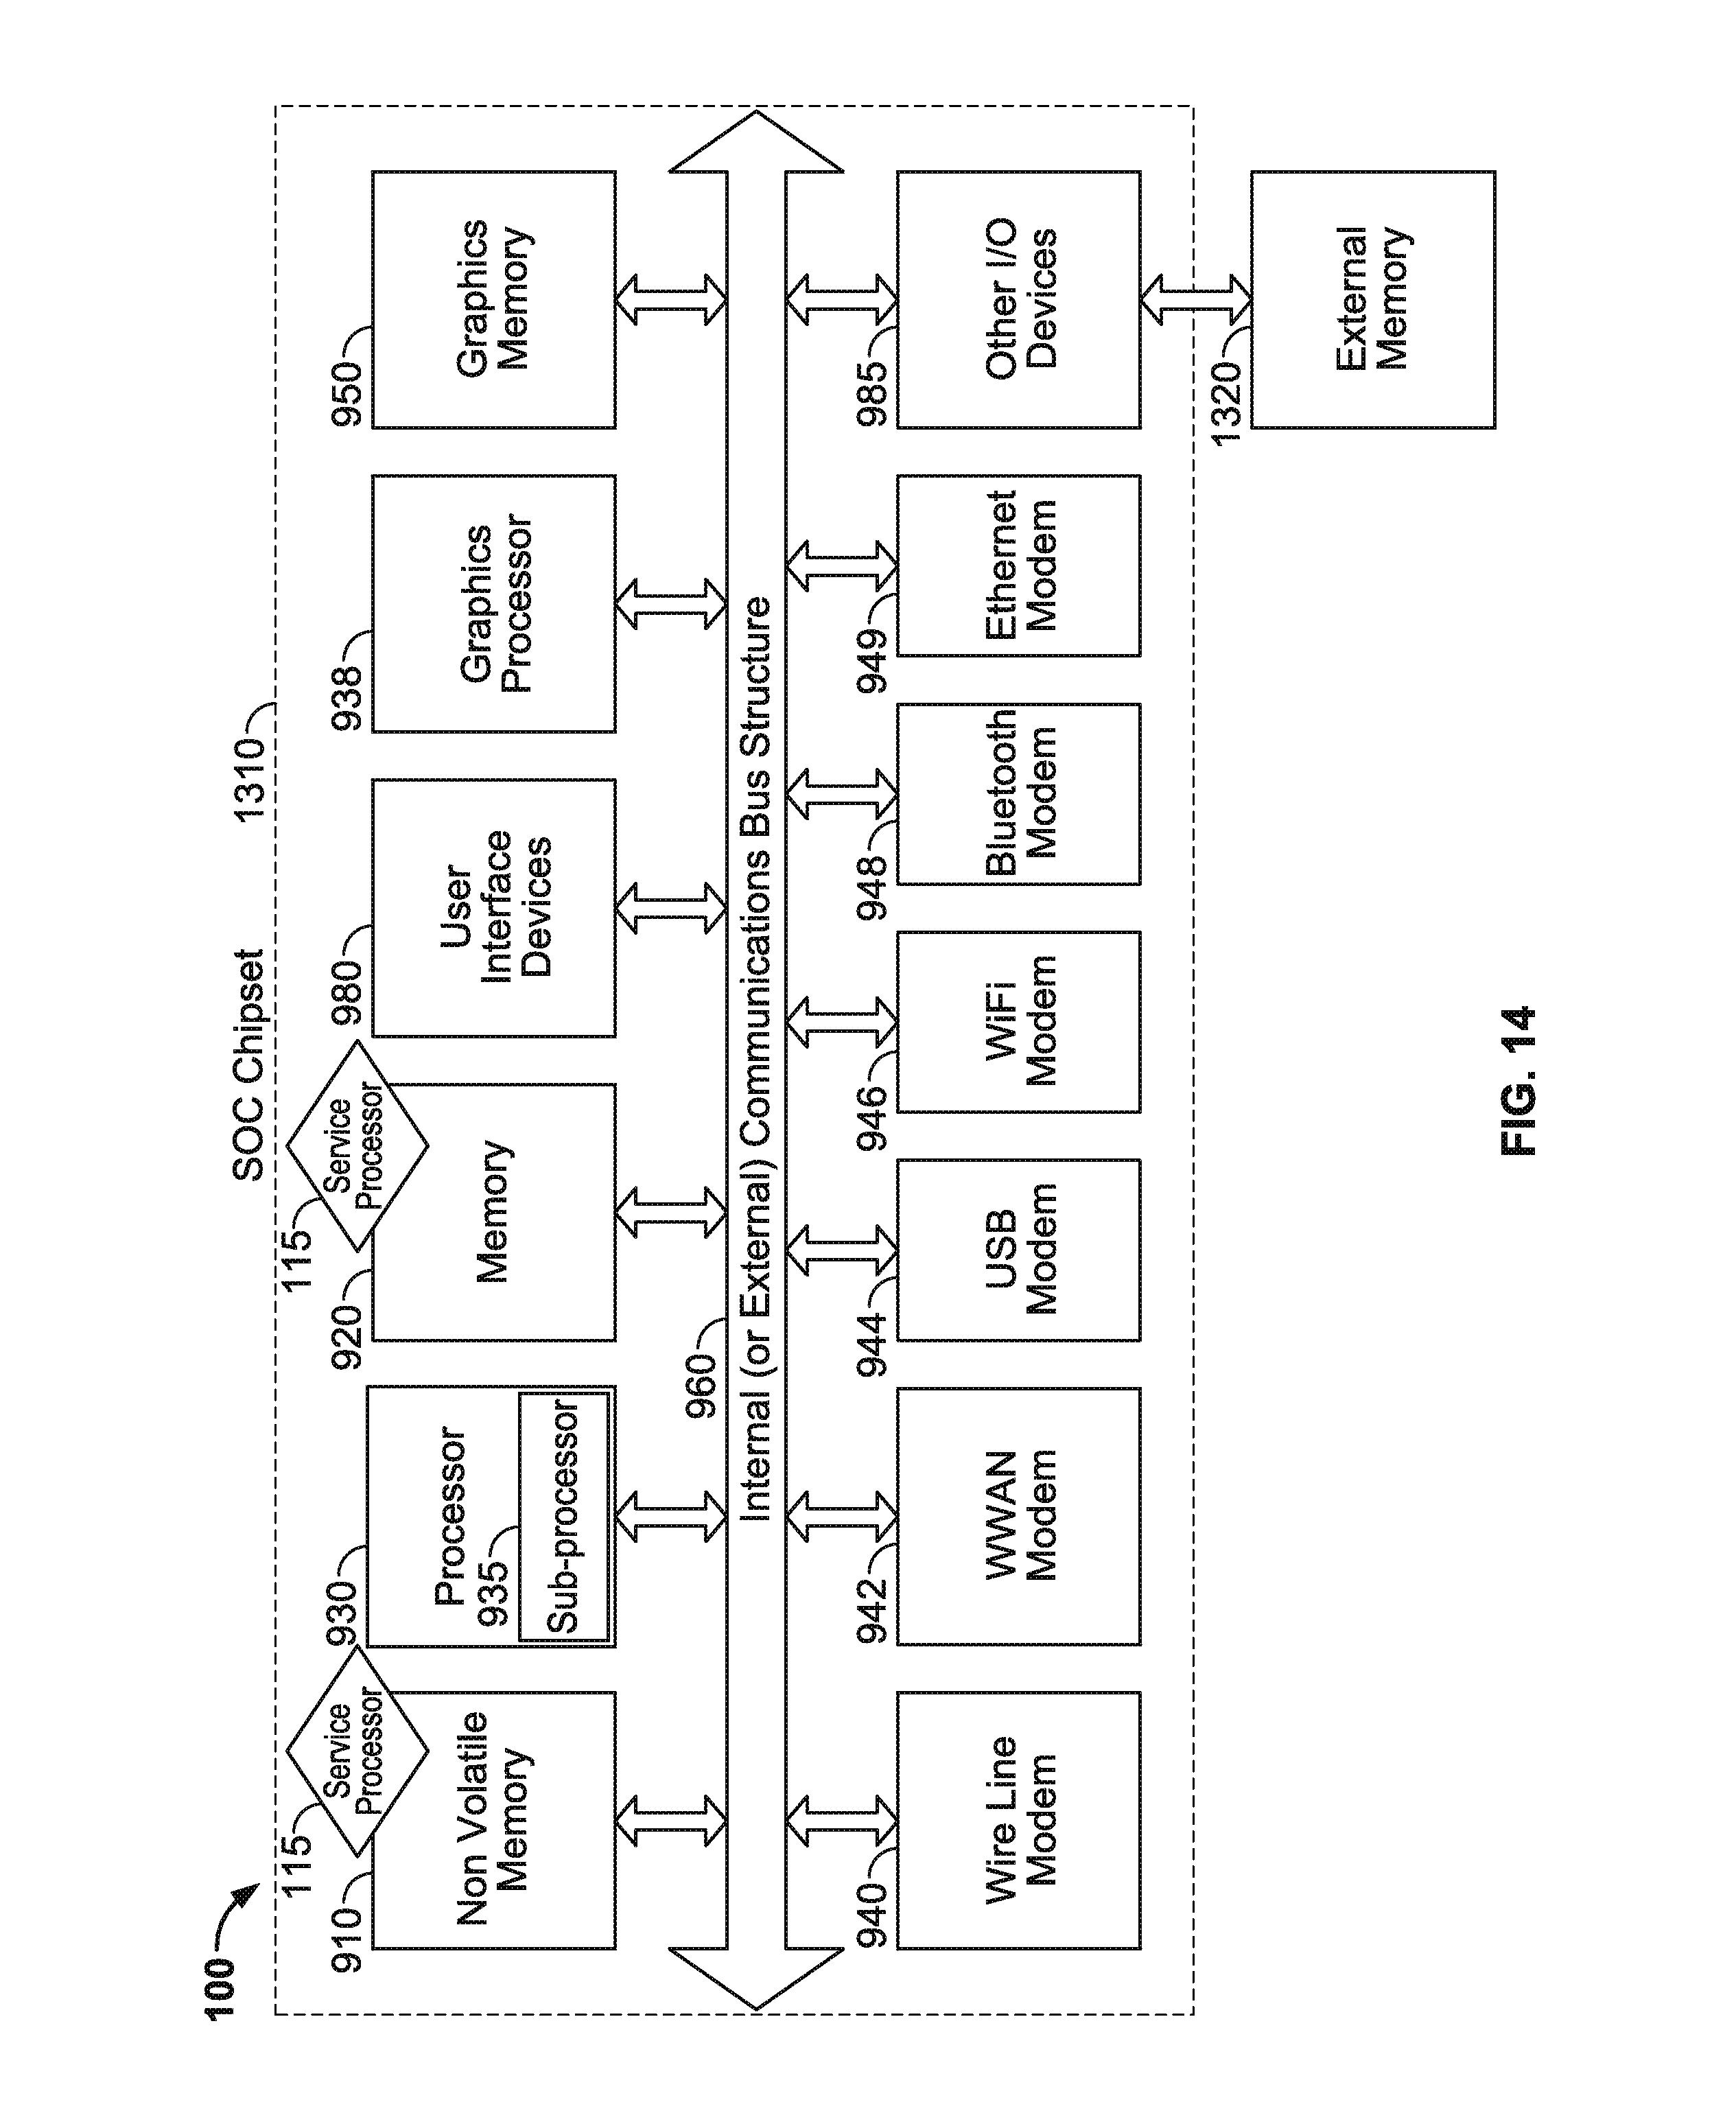 Patent US 8,570,908 B2